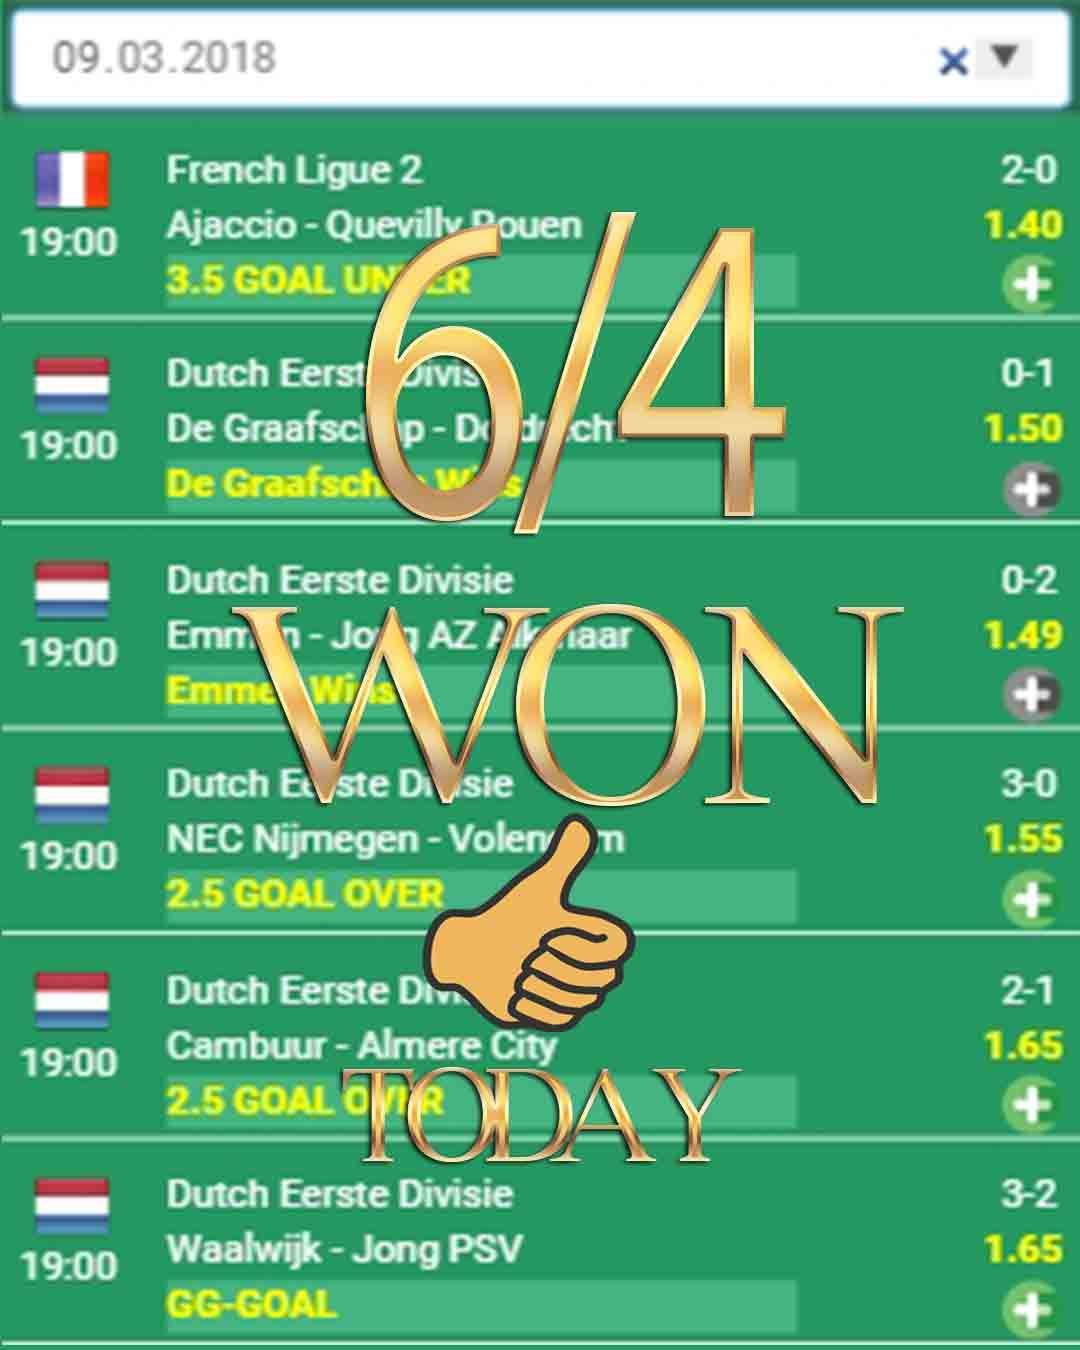 6/4 WON betting expert, betting sports, betting advice